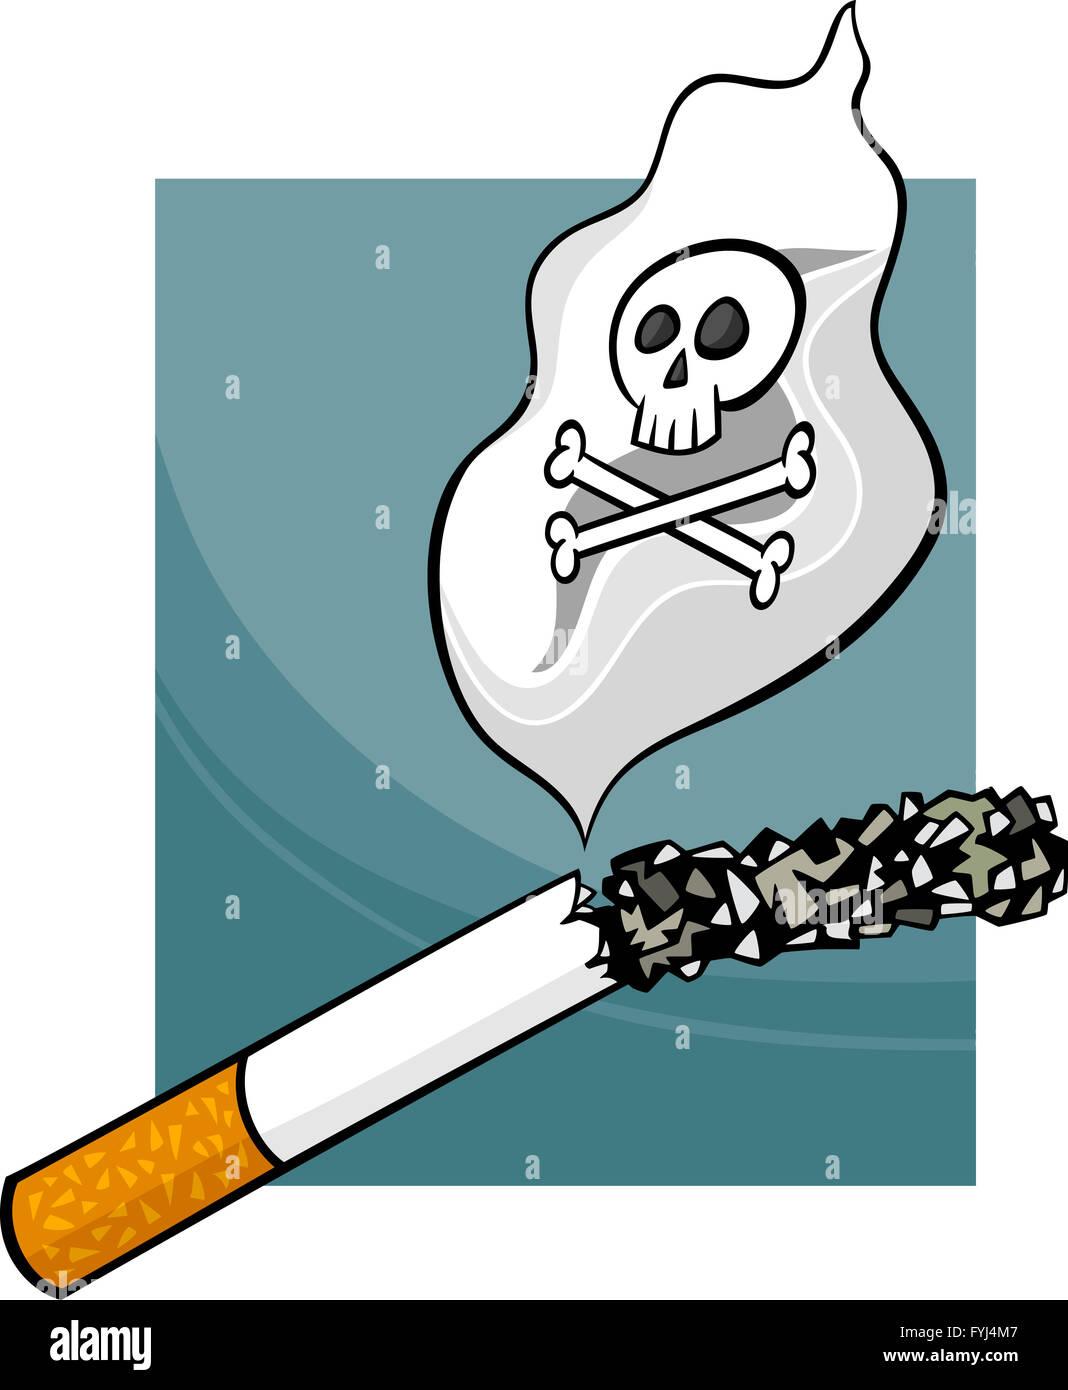 Smoking Addiction Cartoon High Resolution Stock Photography And Images Alamy